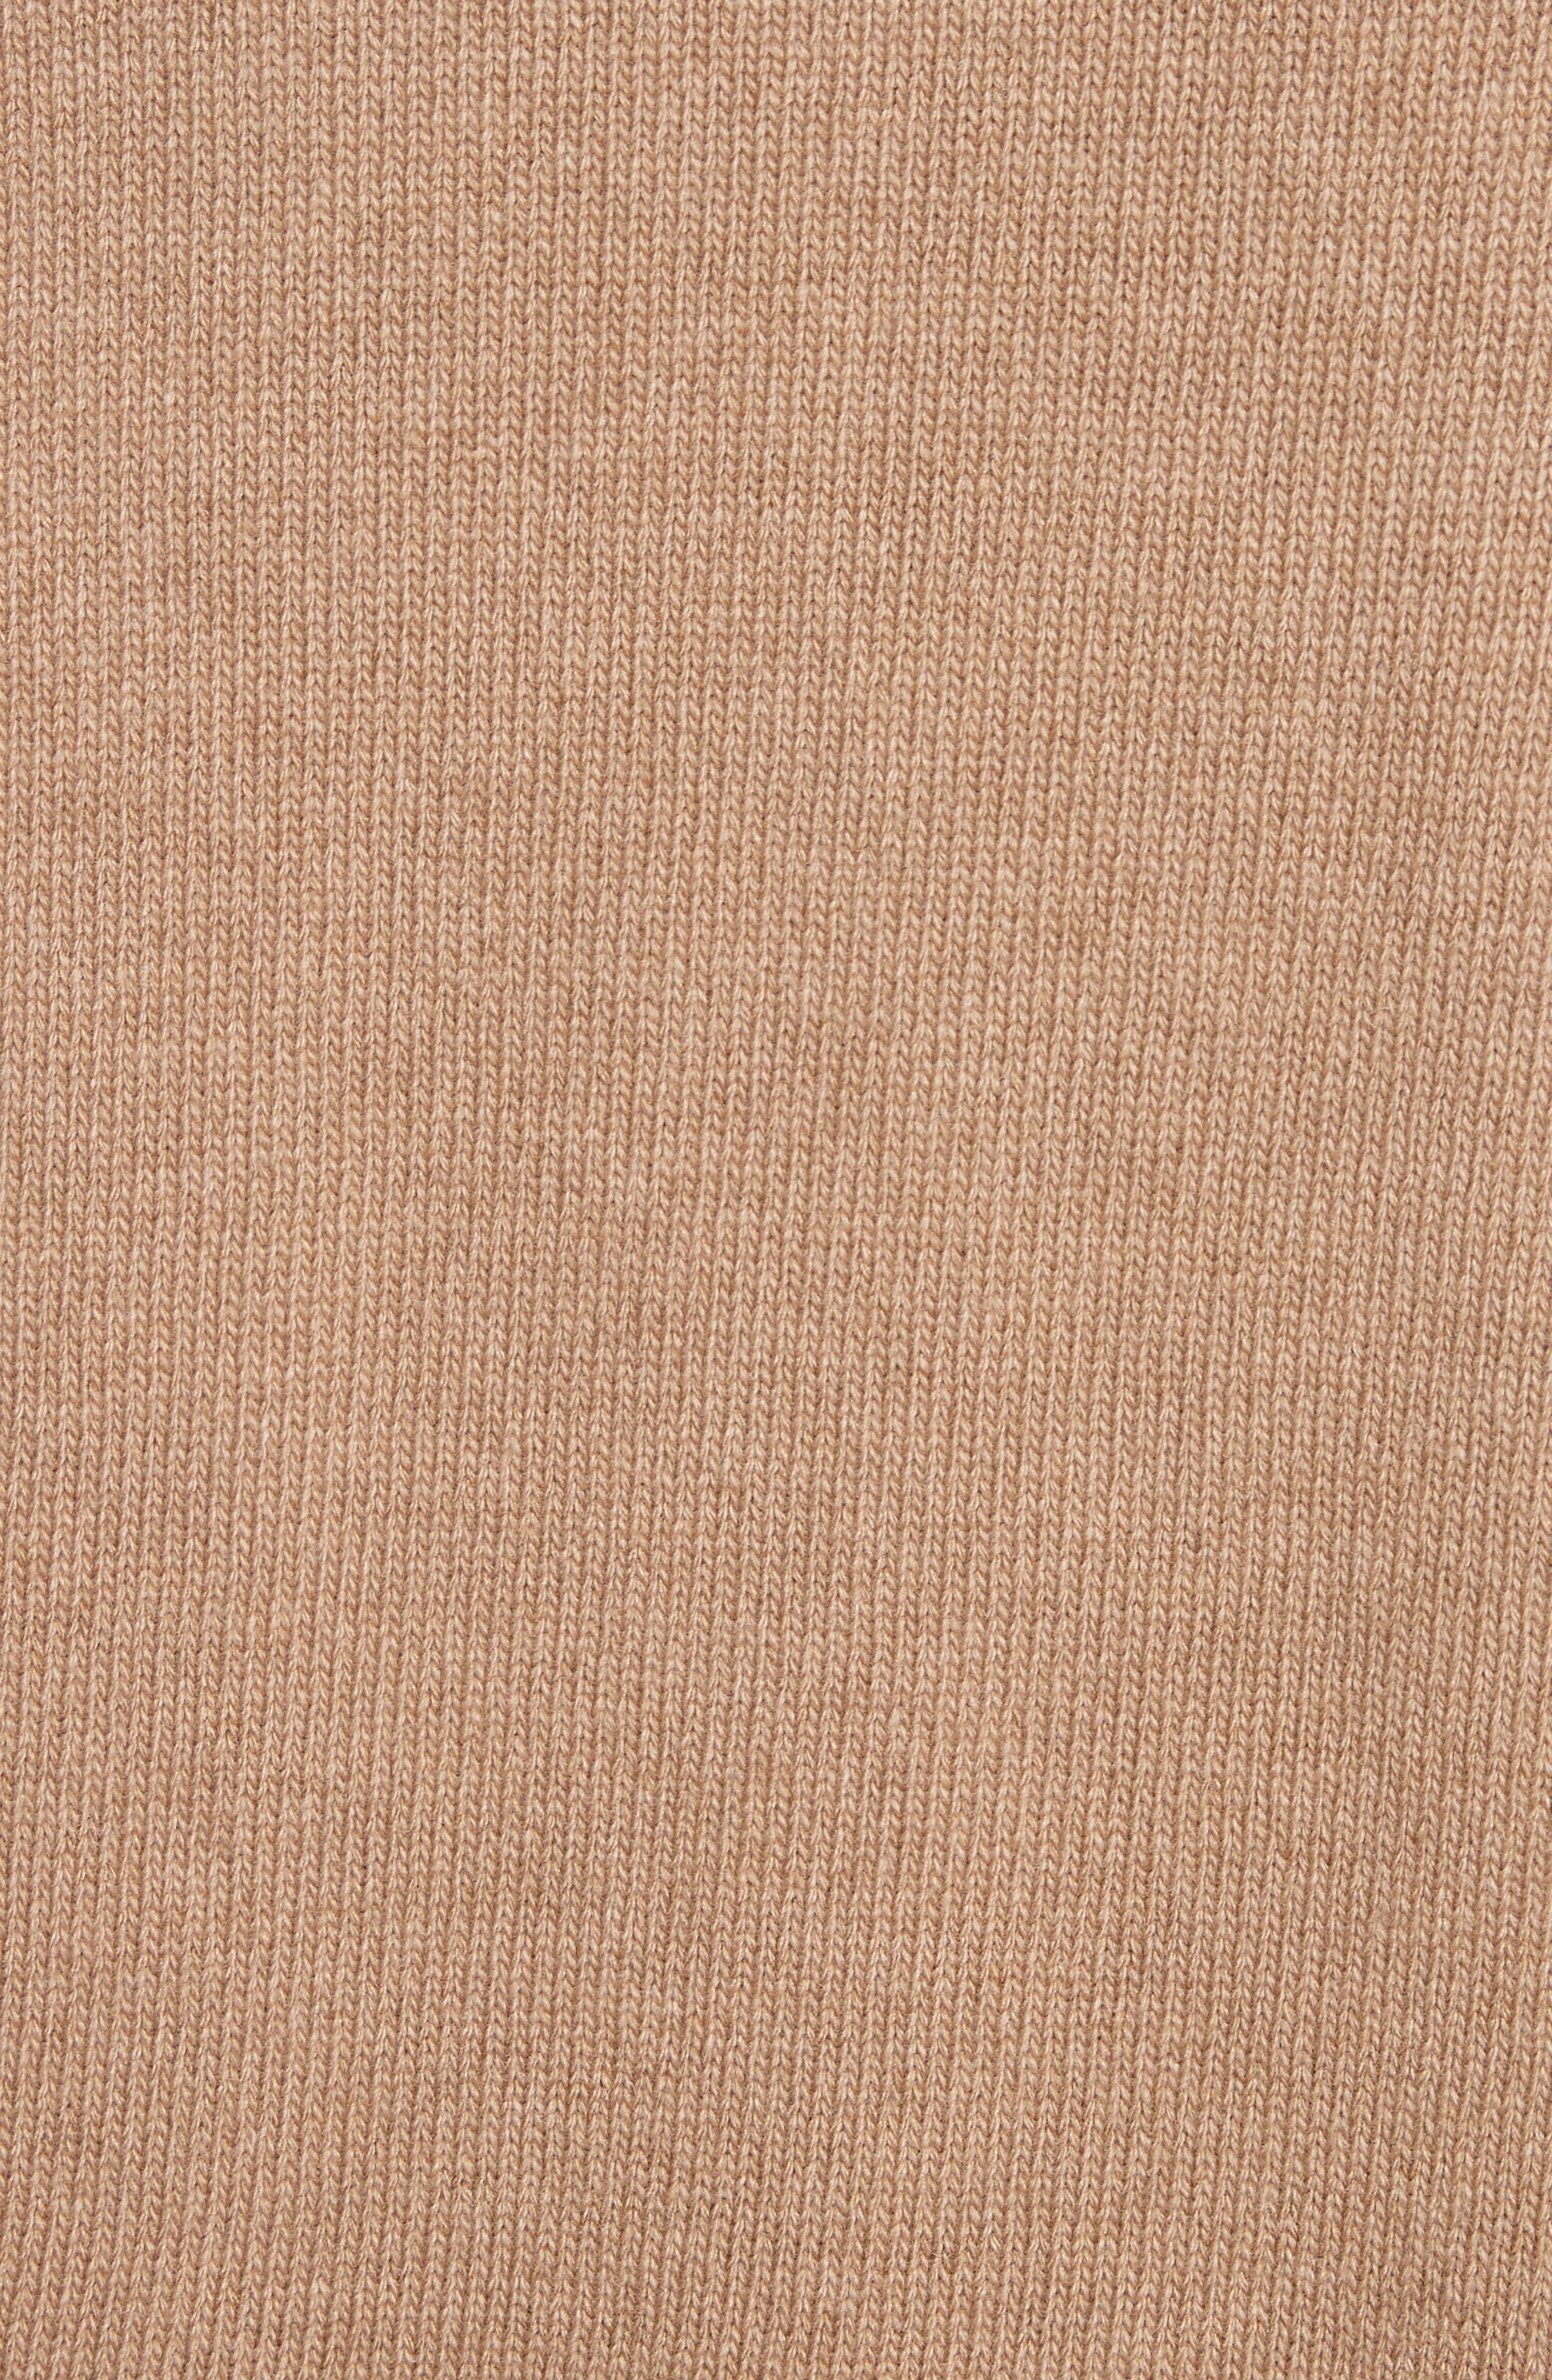 Suede Zip Detail Wool & Cashmere Crop Sweater,                             Alternate thumbnail 5, color,                             Cammello Melange